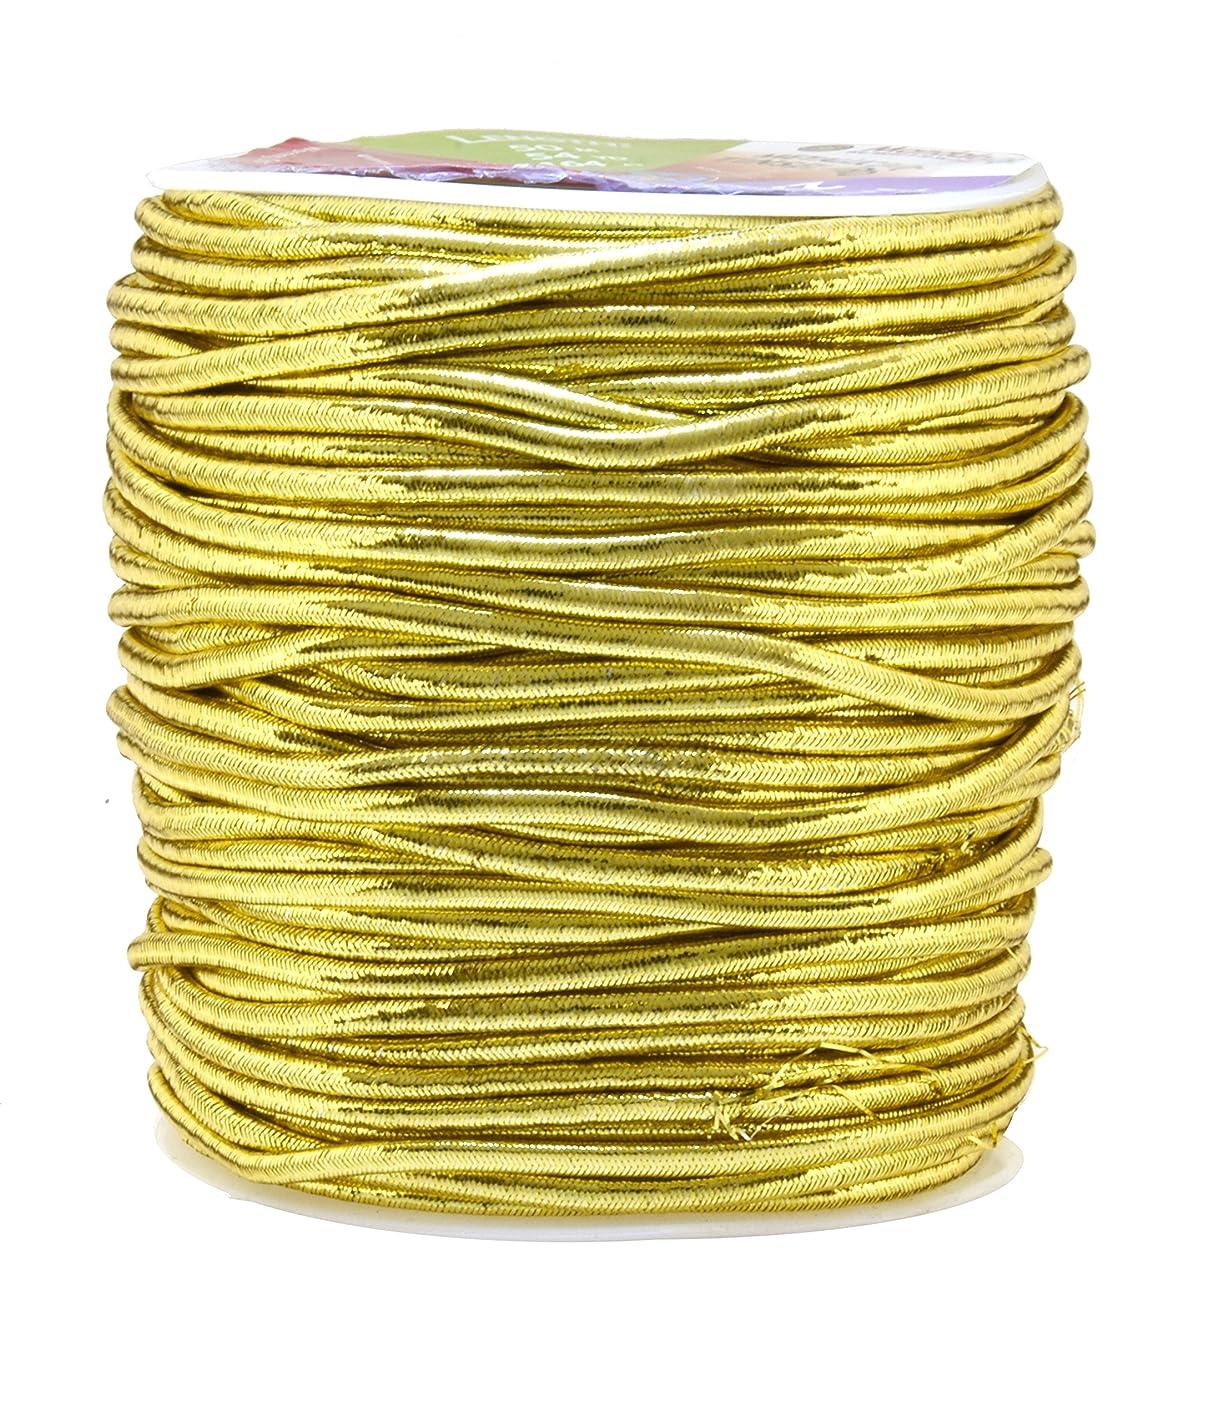 Mandala Crafts 1mm 1.5mm 2.5mm Jewelry Making Gift Wrap Ribbon Stretch Metallic Tinsel Elastic Cord (2.5mm 54 Yards Light Gold)